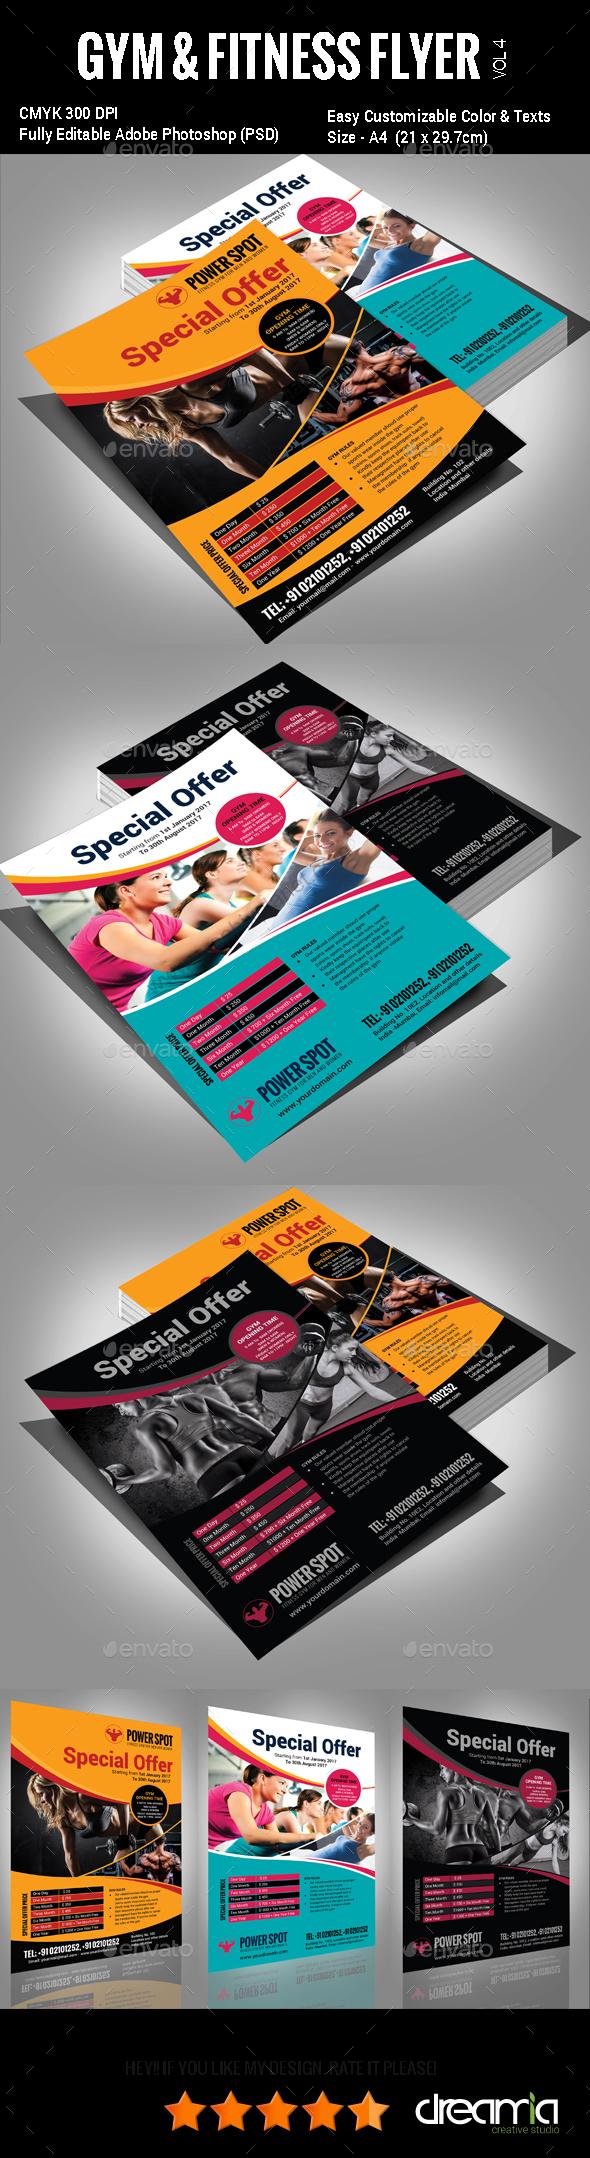 Gym & Fitness Flyer - Vol3